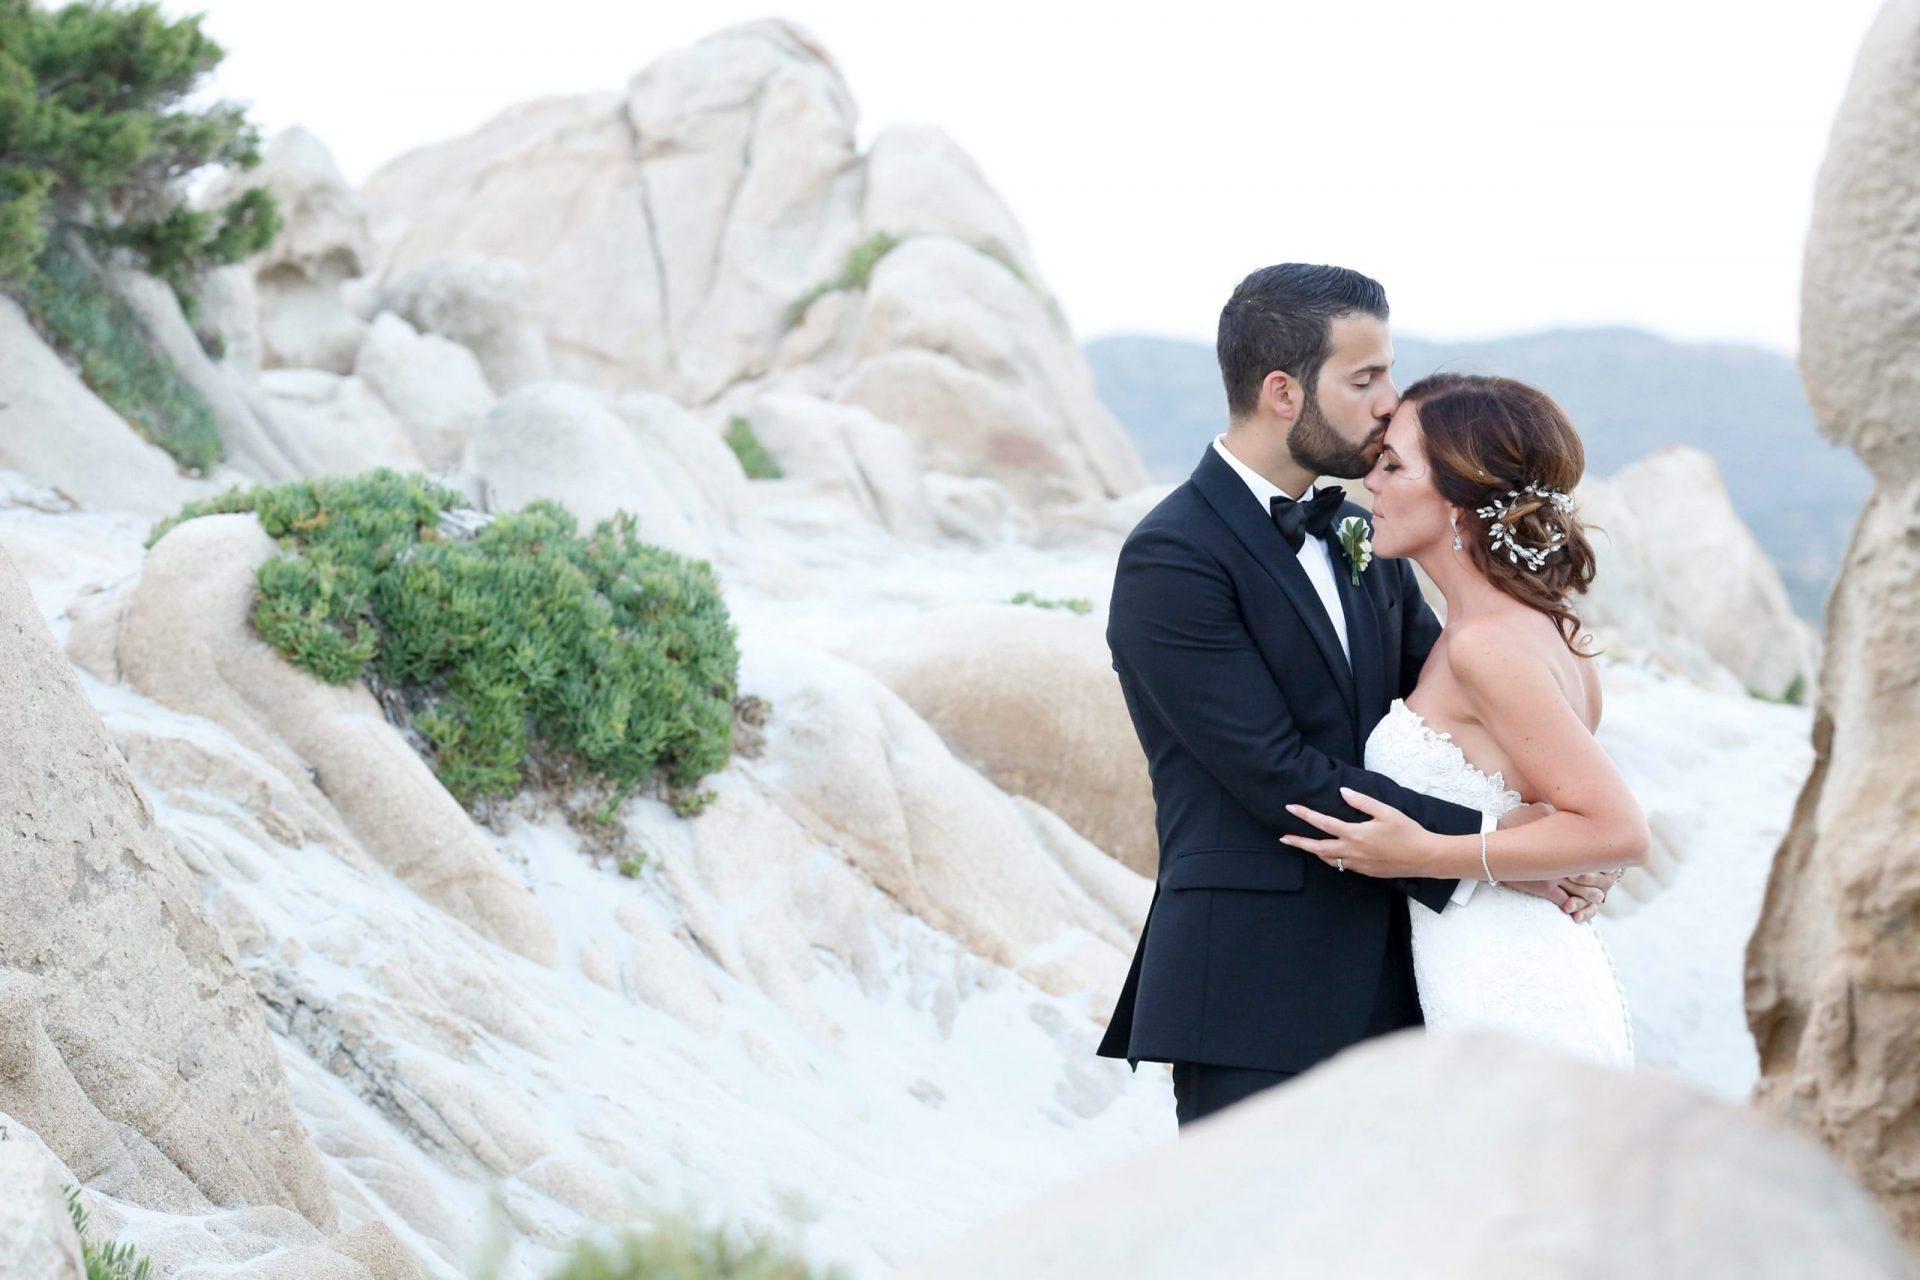 Enza e Samuele, the bride and the groom